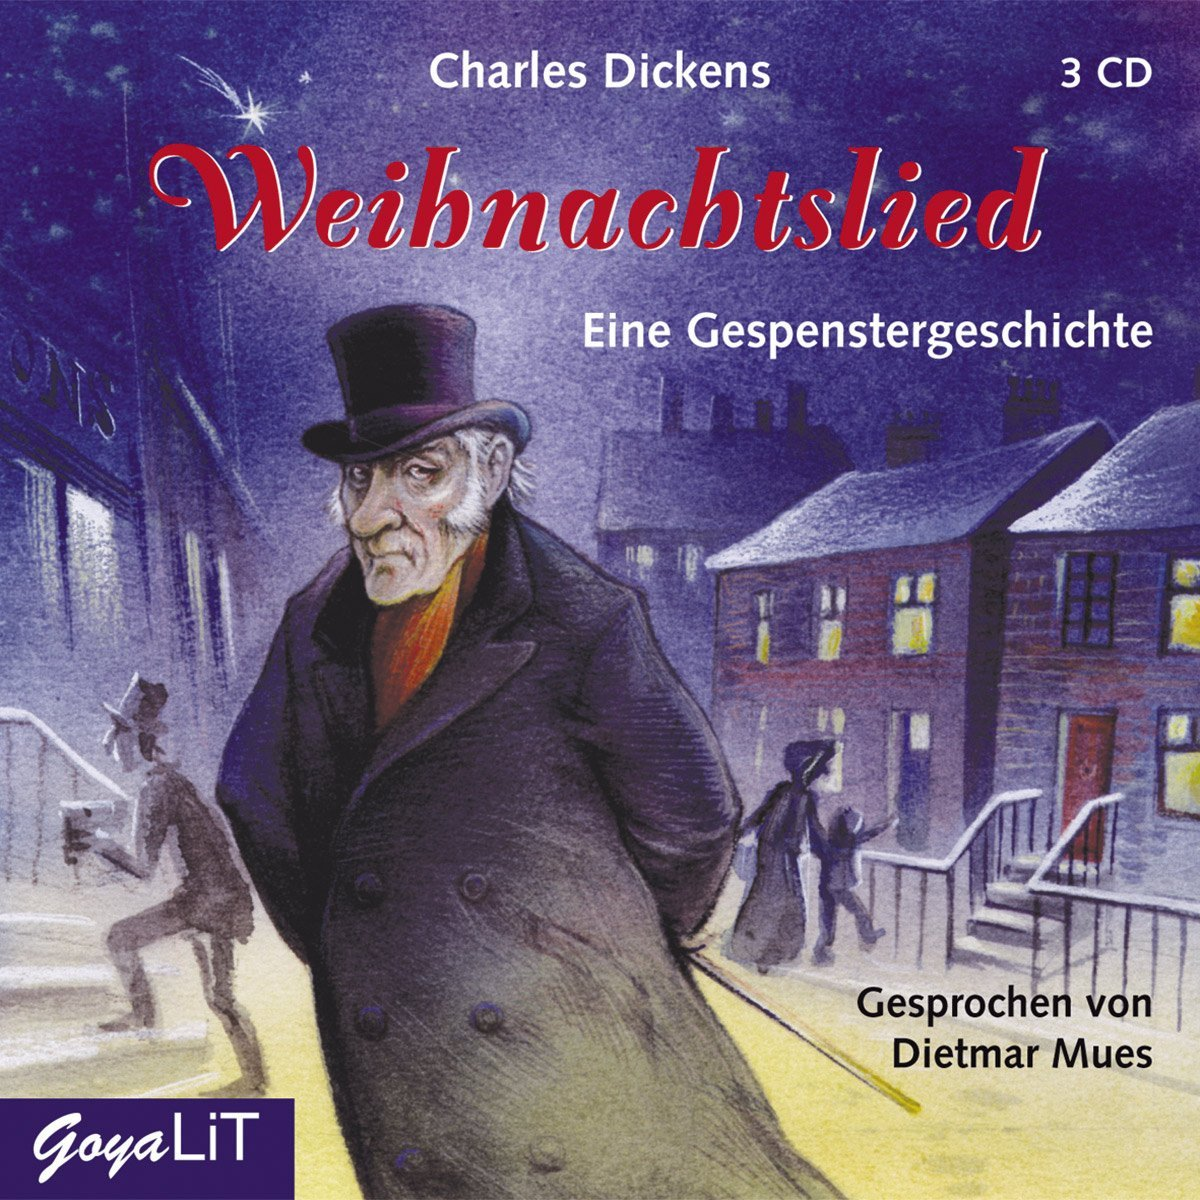 Weihnachtslied - Dietmar Mues, Charles Dickens: Amazon.de: Musik